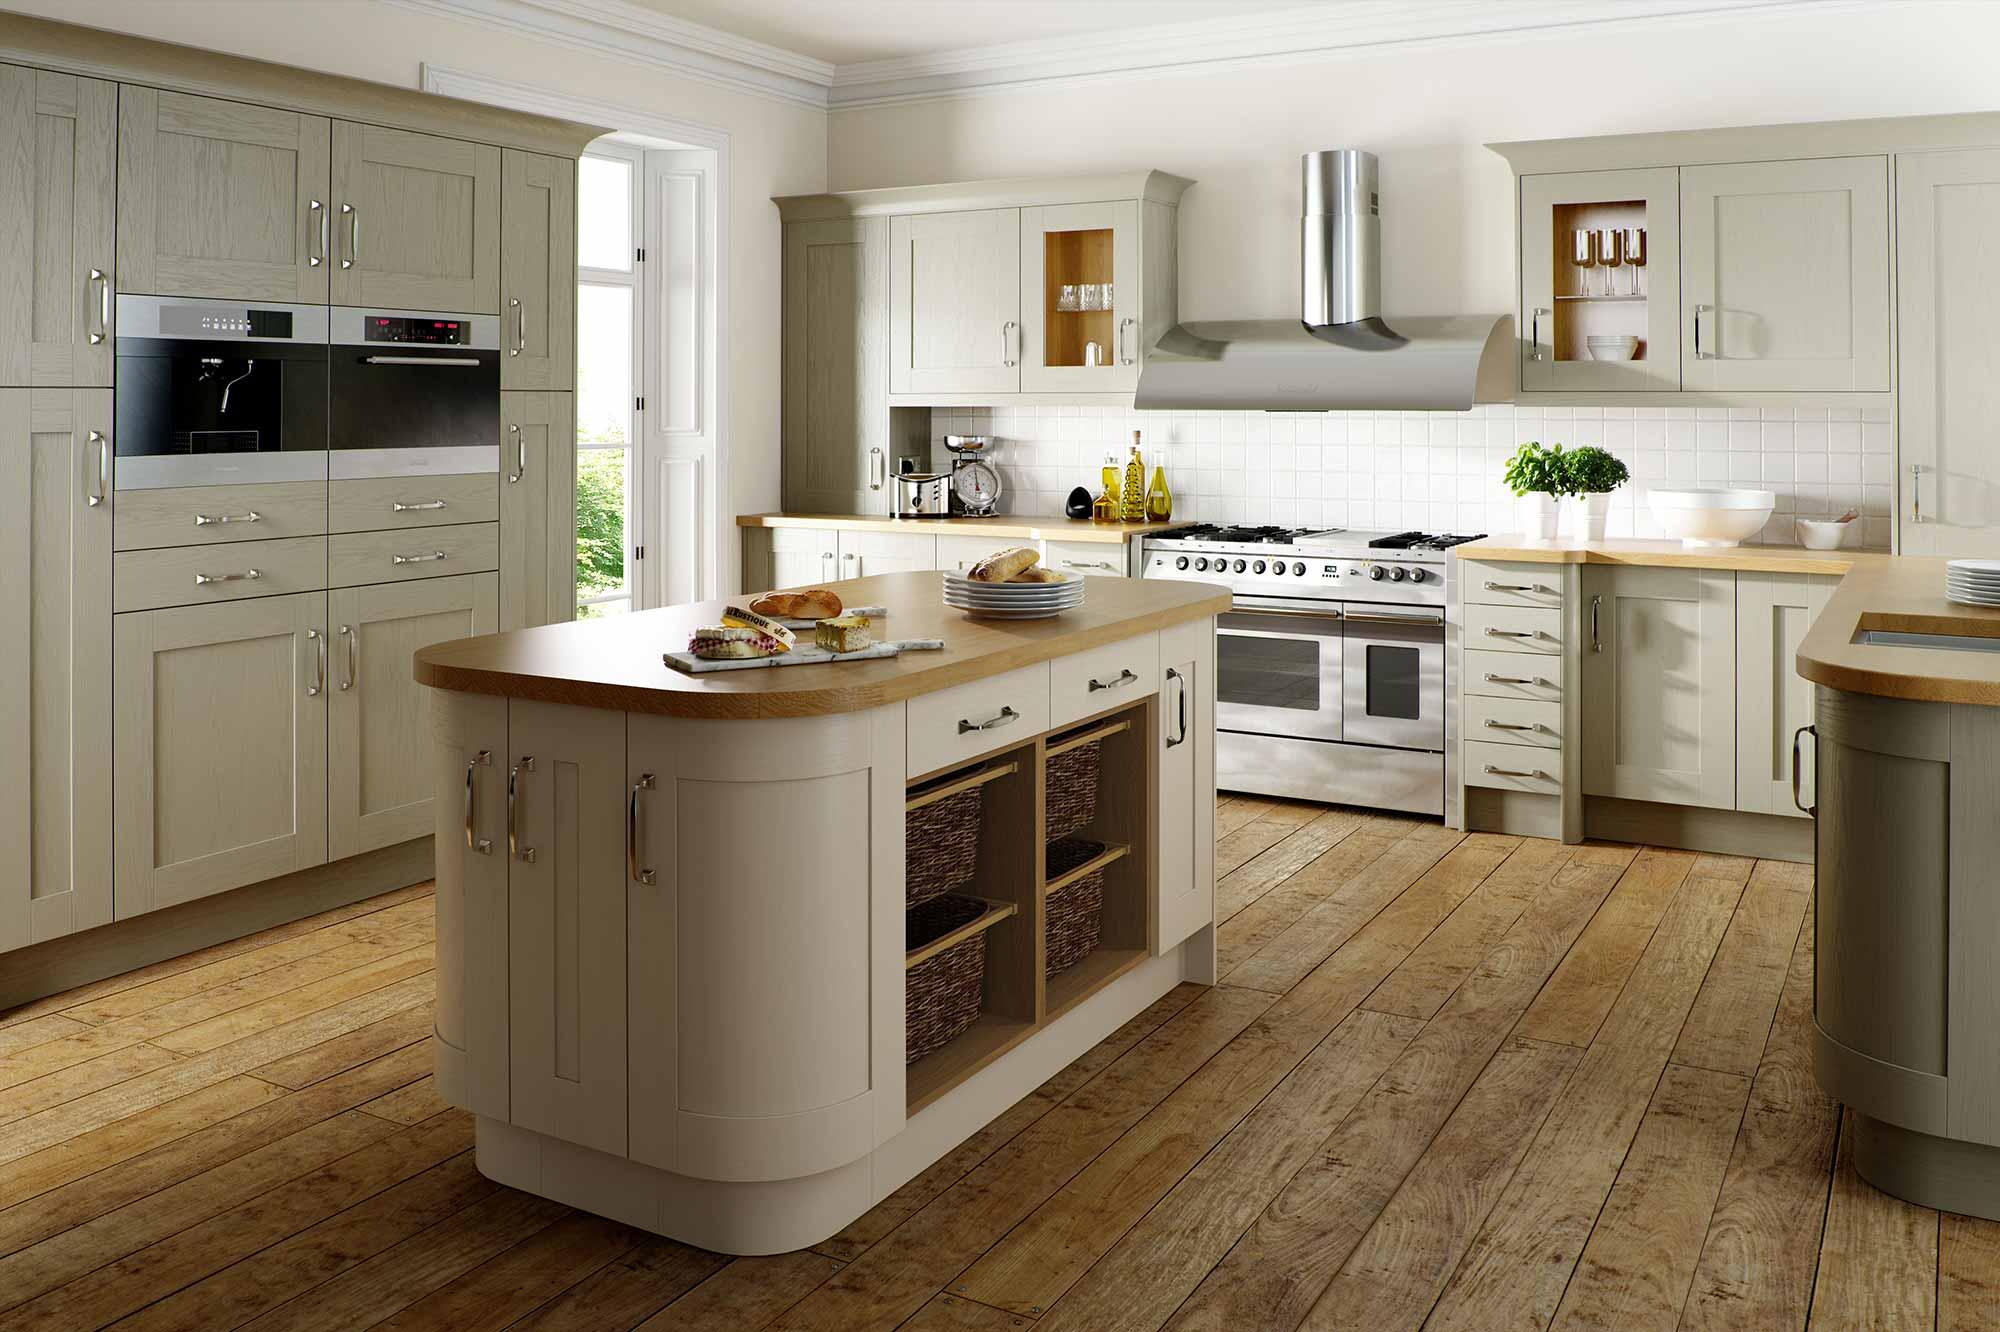 Luxury Kitchens Glasgow 3